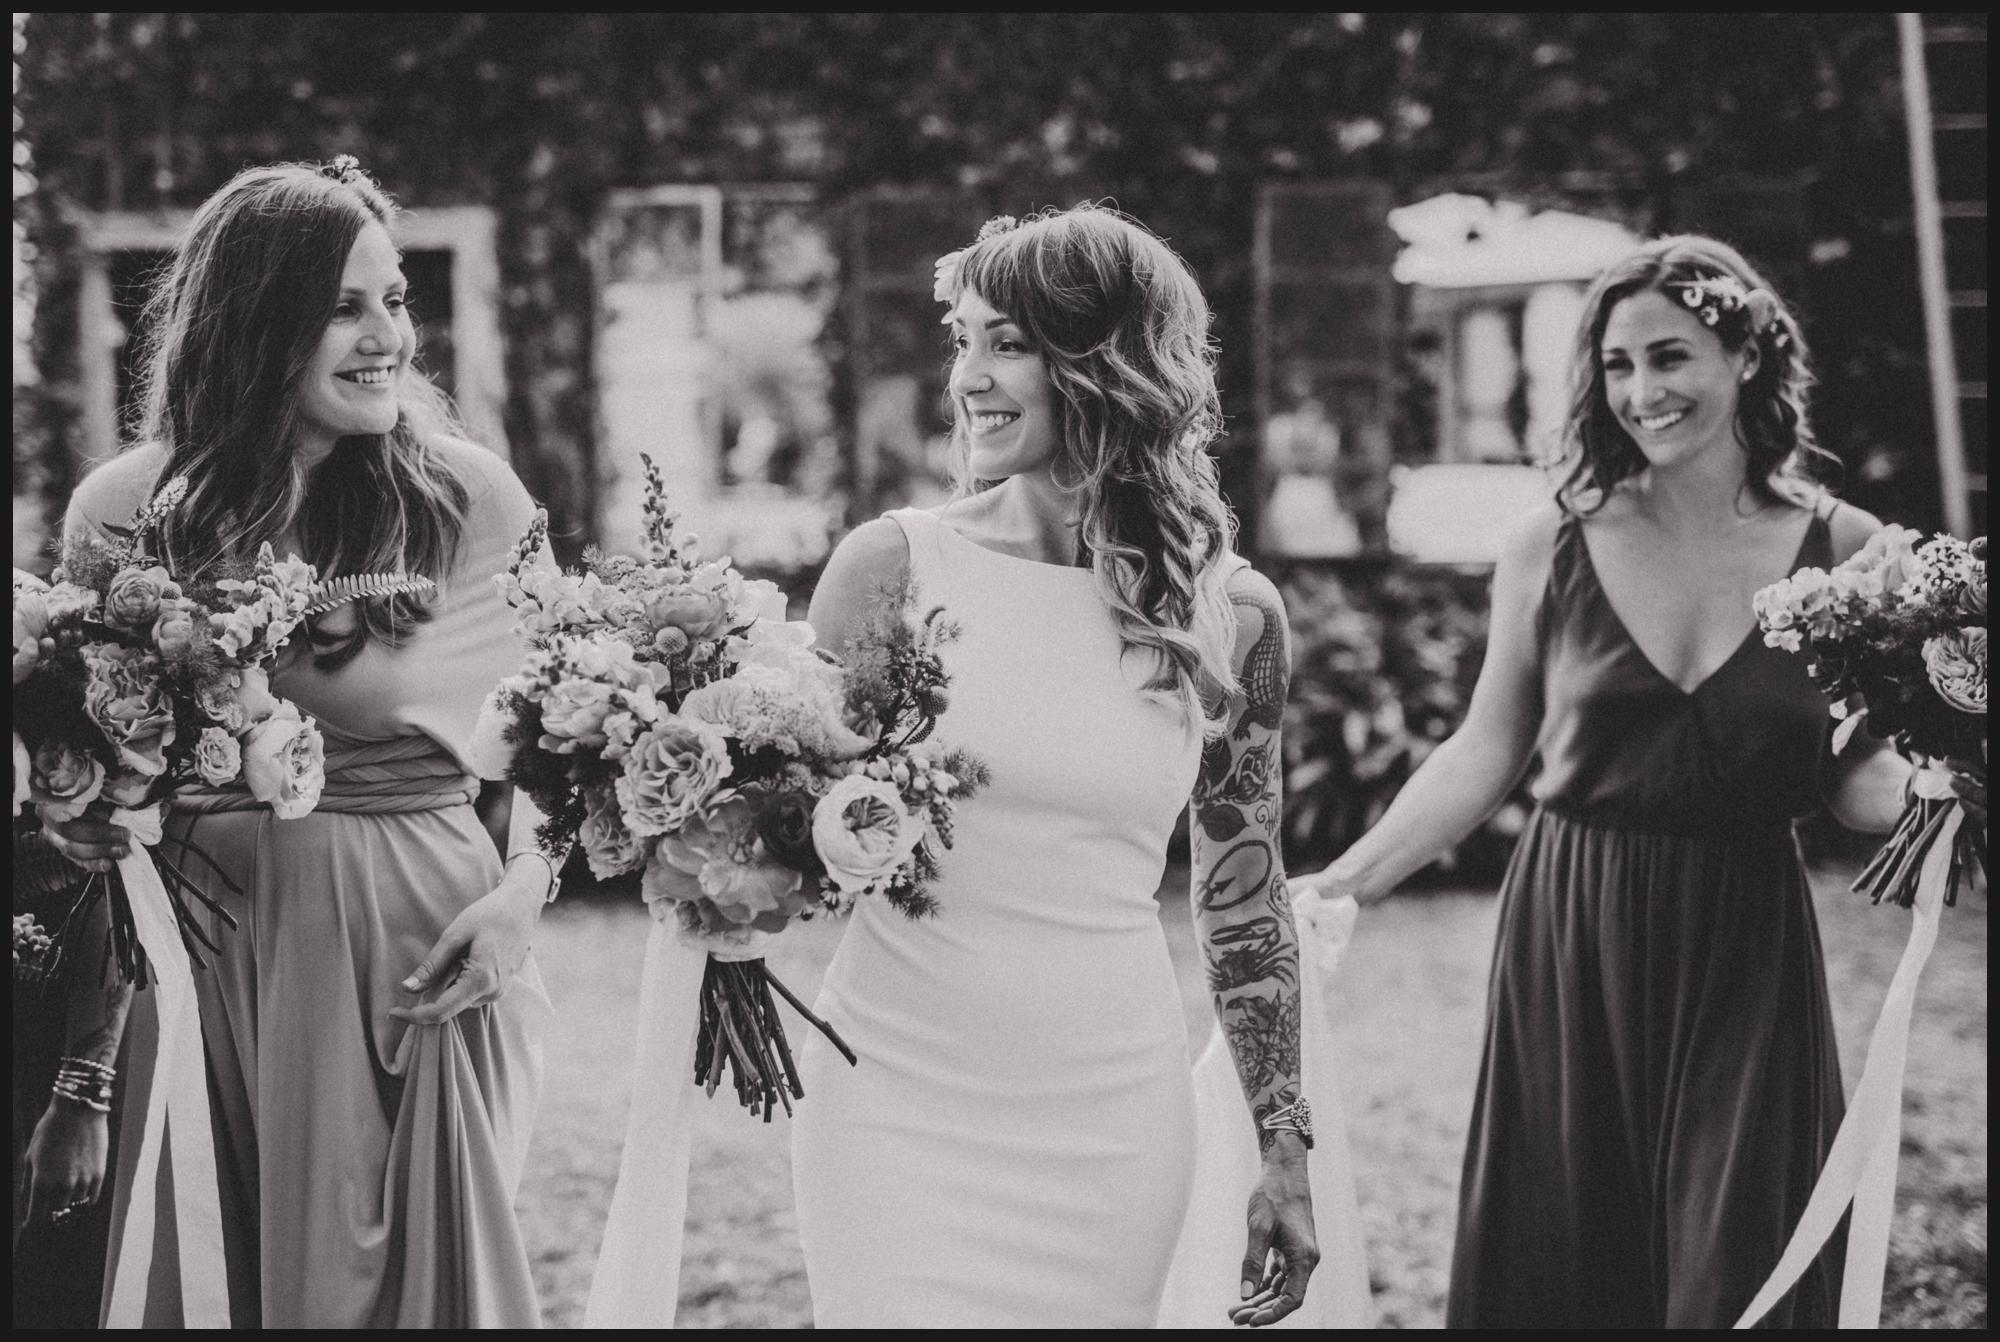 Orlando-Wedding-Photographer-destination-wedding-photographer-florida-wedding-photographer-bohemian-wedding-photographer_1985.jpg